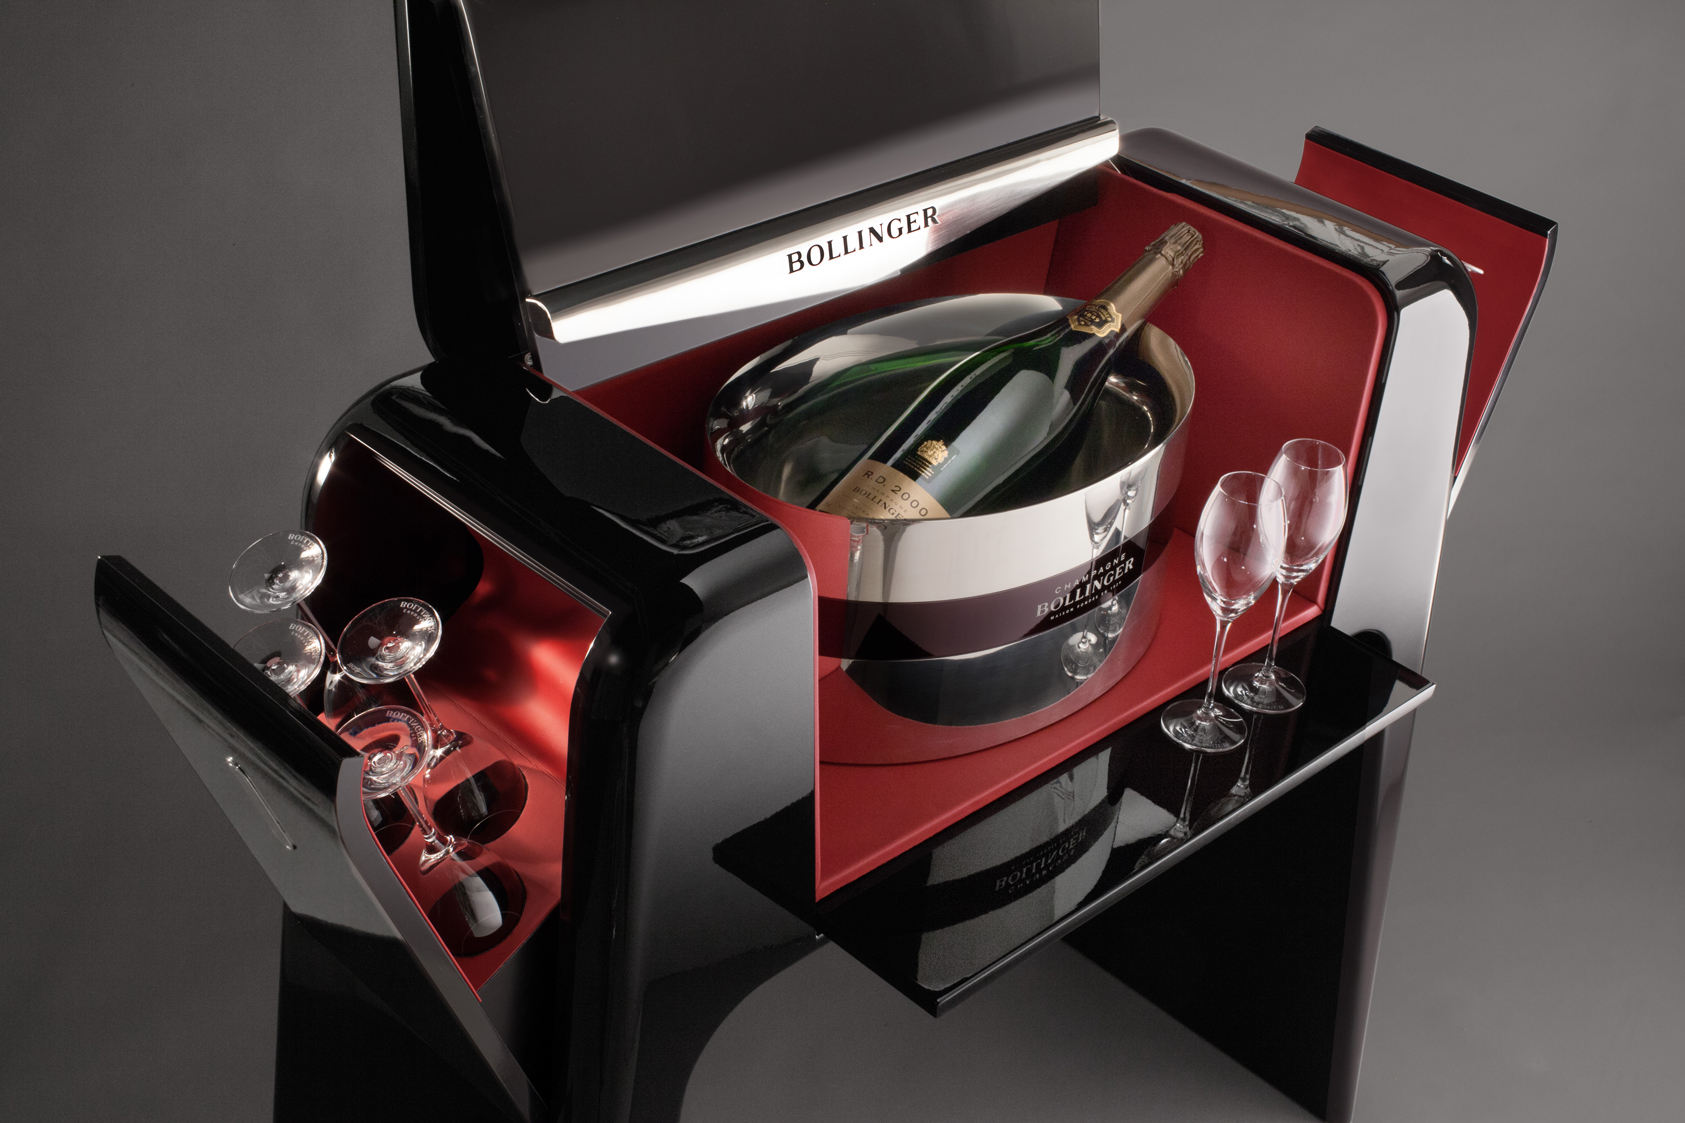 BOLLINGER_Experience_MOBILIER_bar_Spiritueux-ChampagnePLANET-DESIGN-PARIS-Eric-Berthes_01.jpg